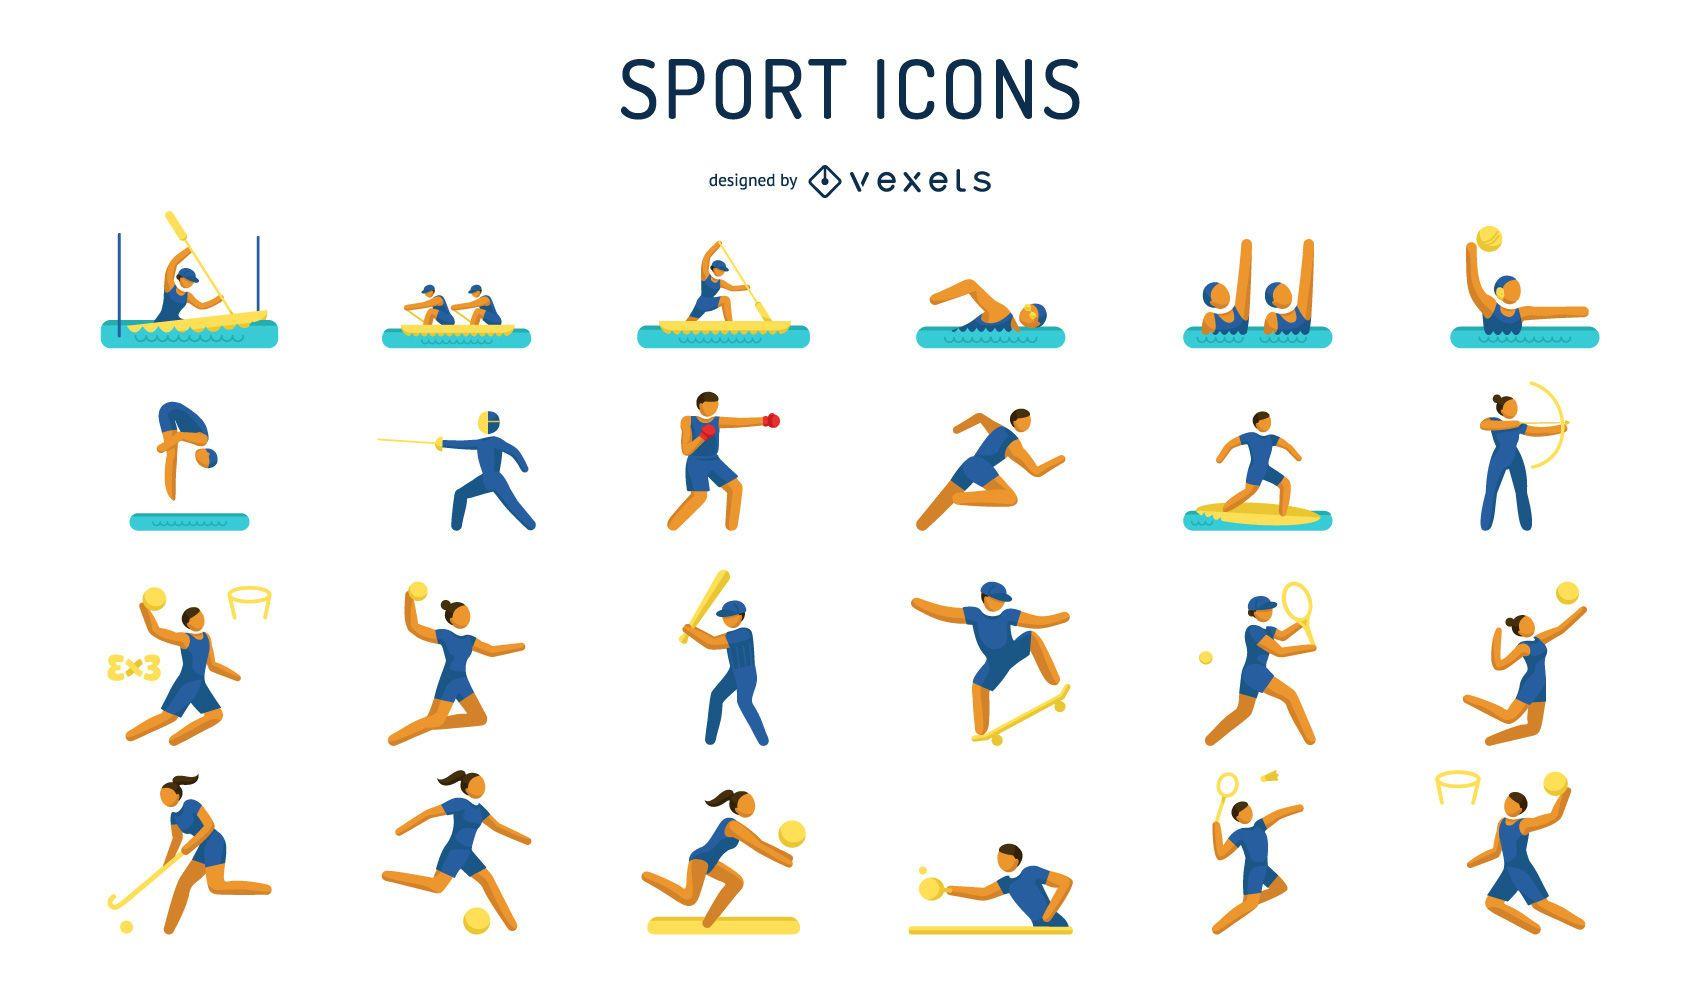 Pacote de ícones de pictograma de jogos Olypmic